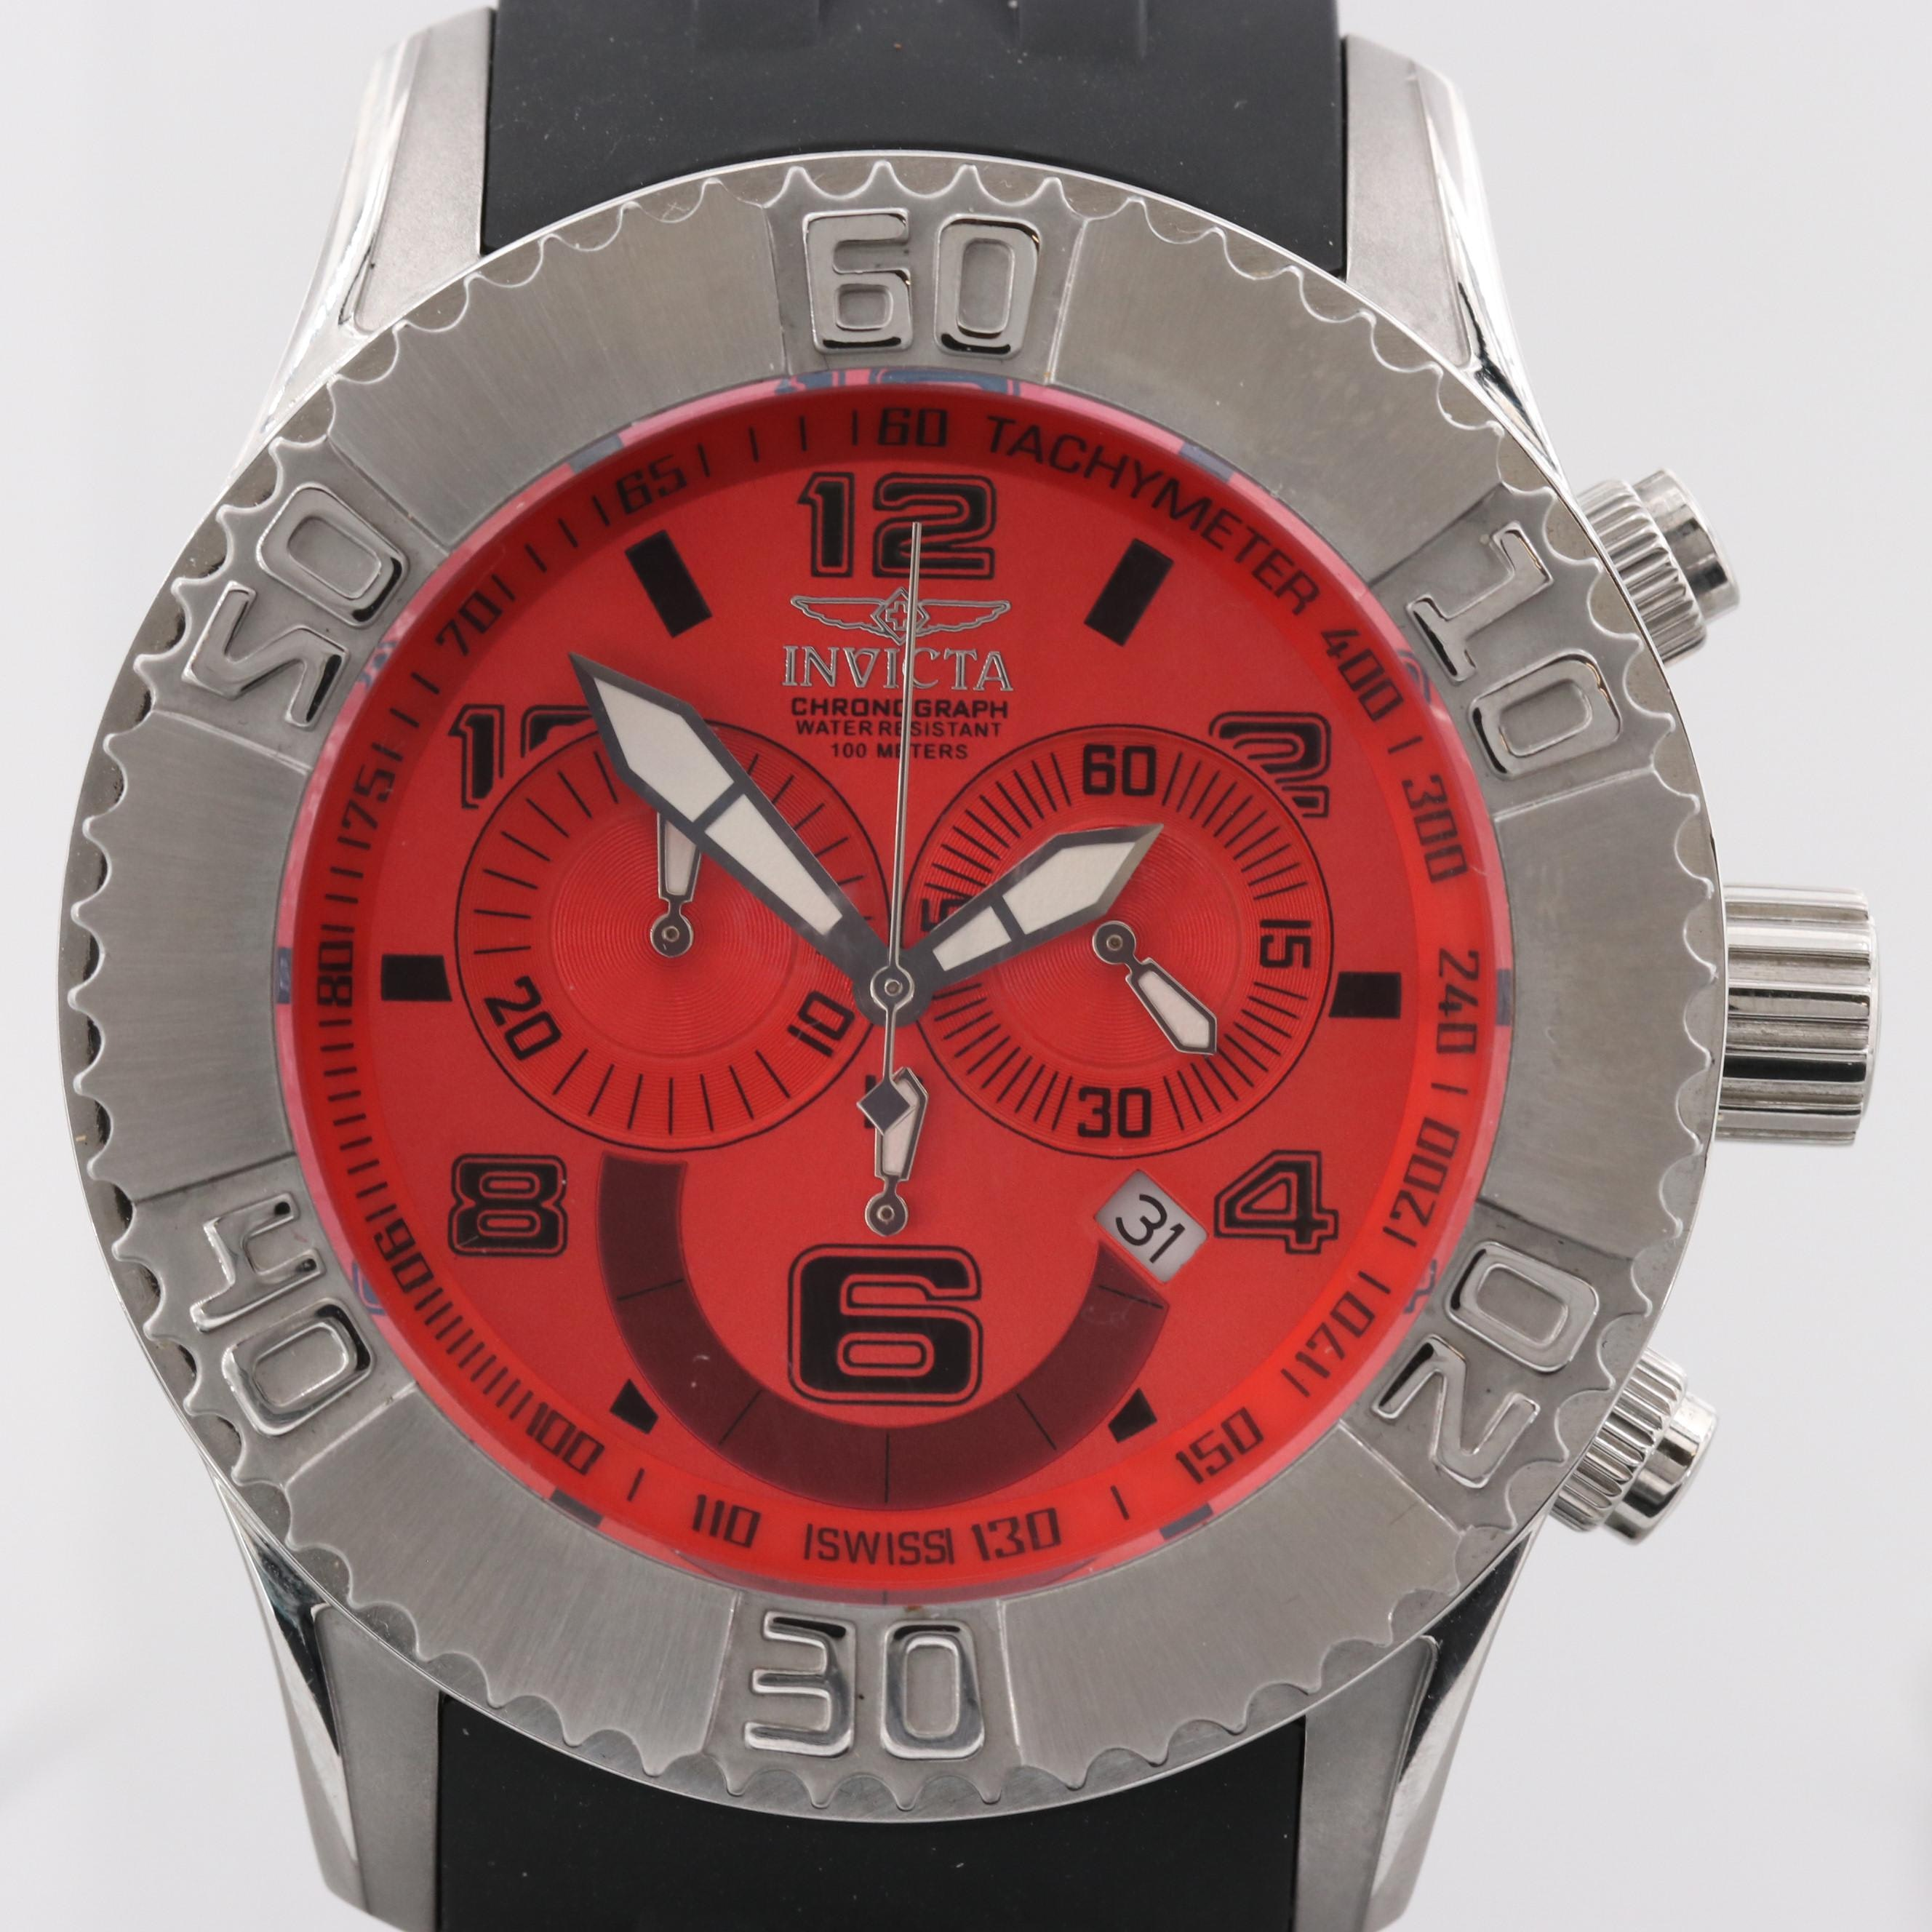 Invicta Seaspider Stainless Steel Quartz Chronograph Wristwatch